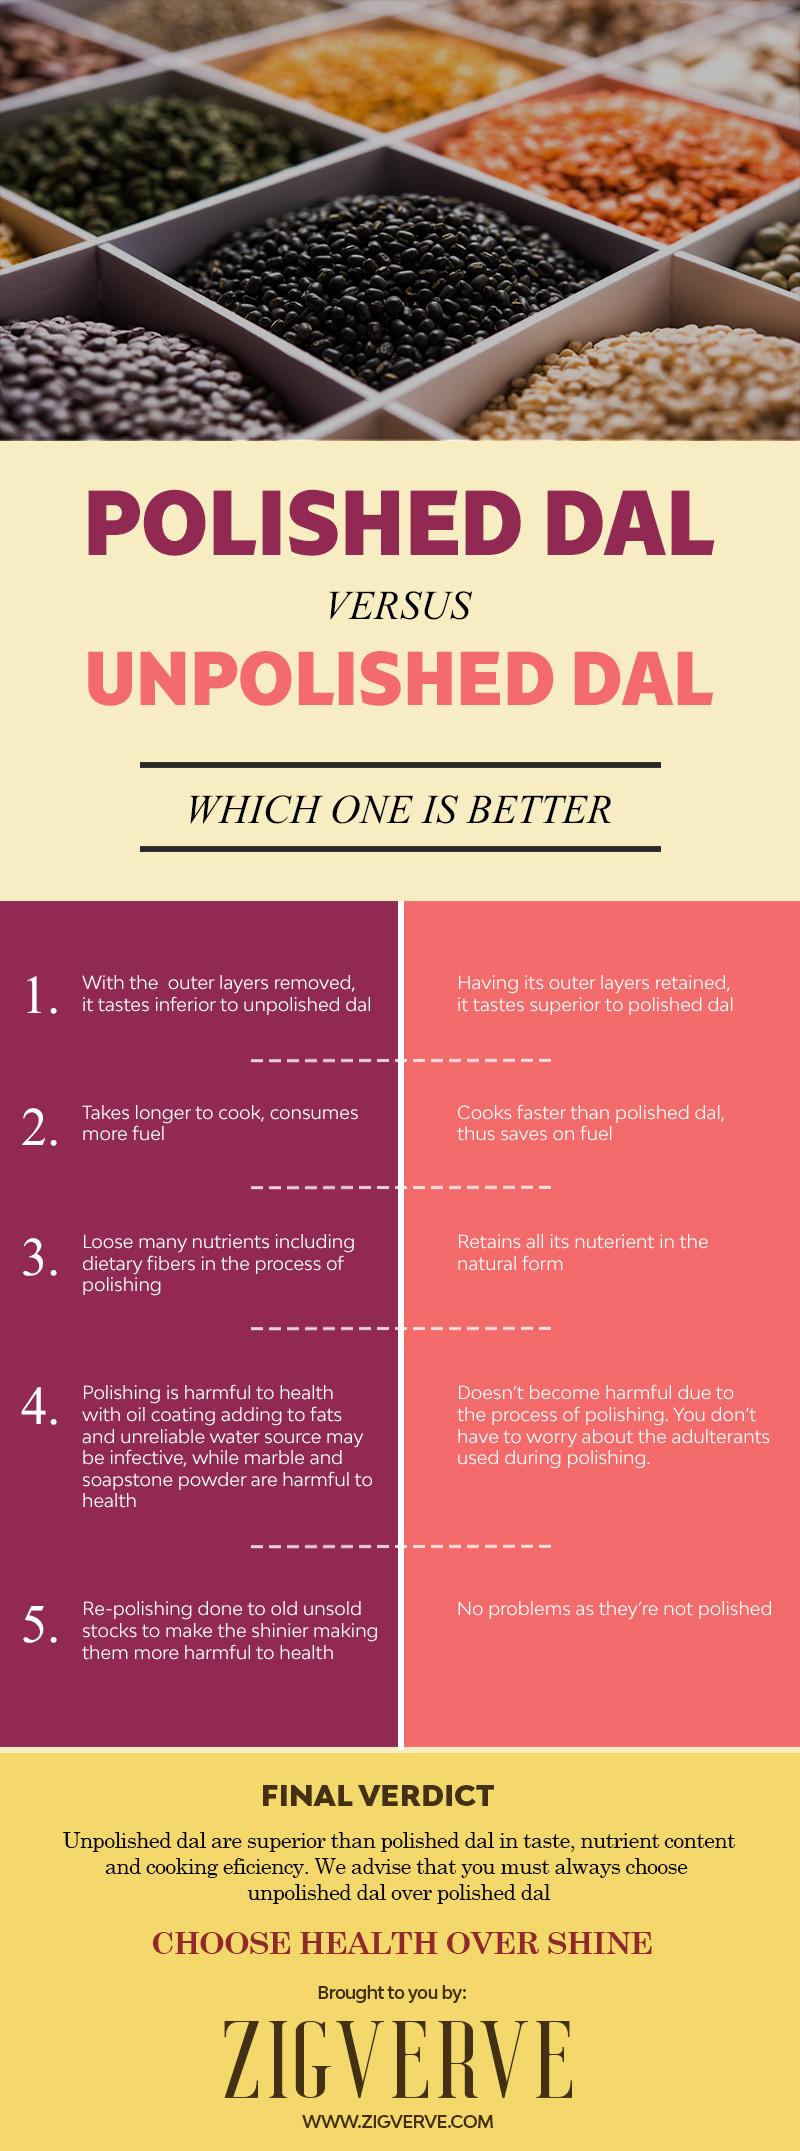 UNPOLISHED DAL VS POLISHED DAL INFOGRAPHIC